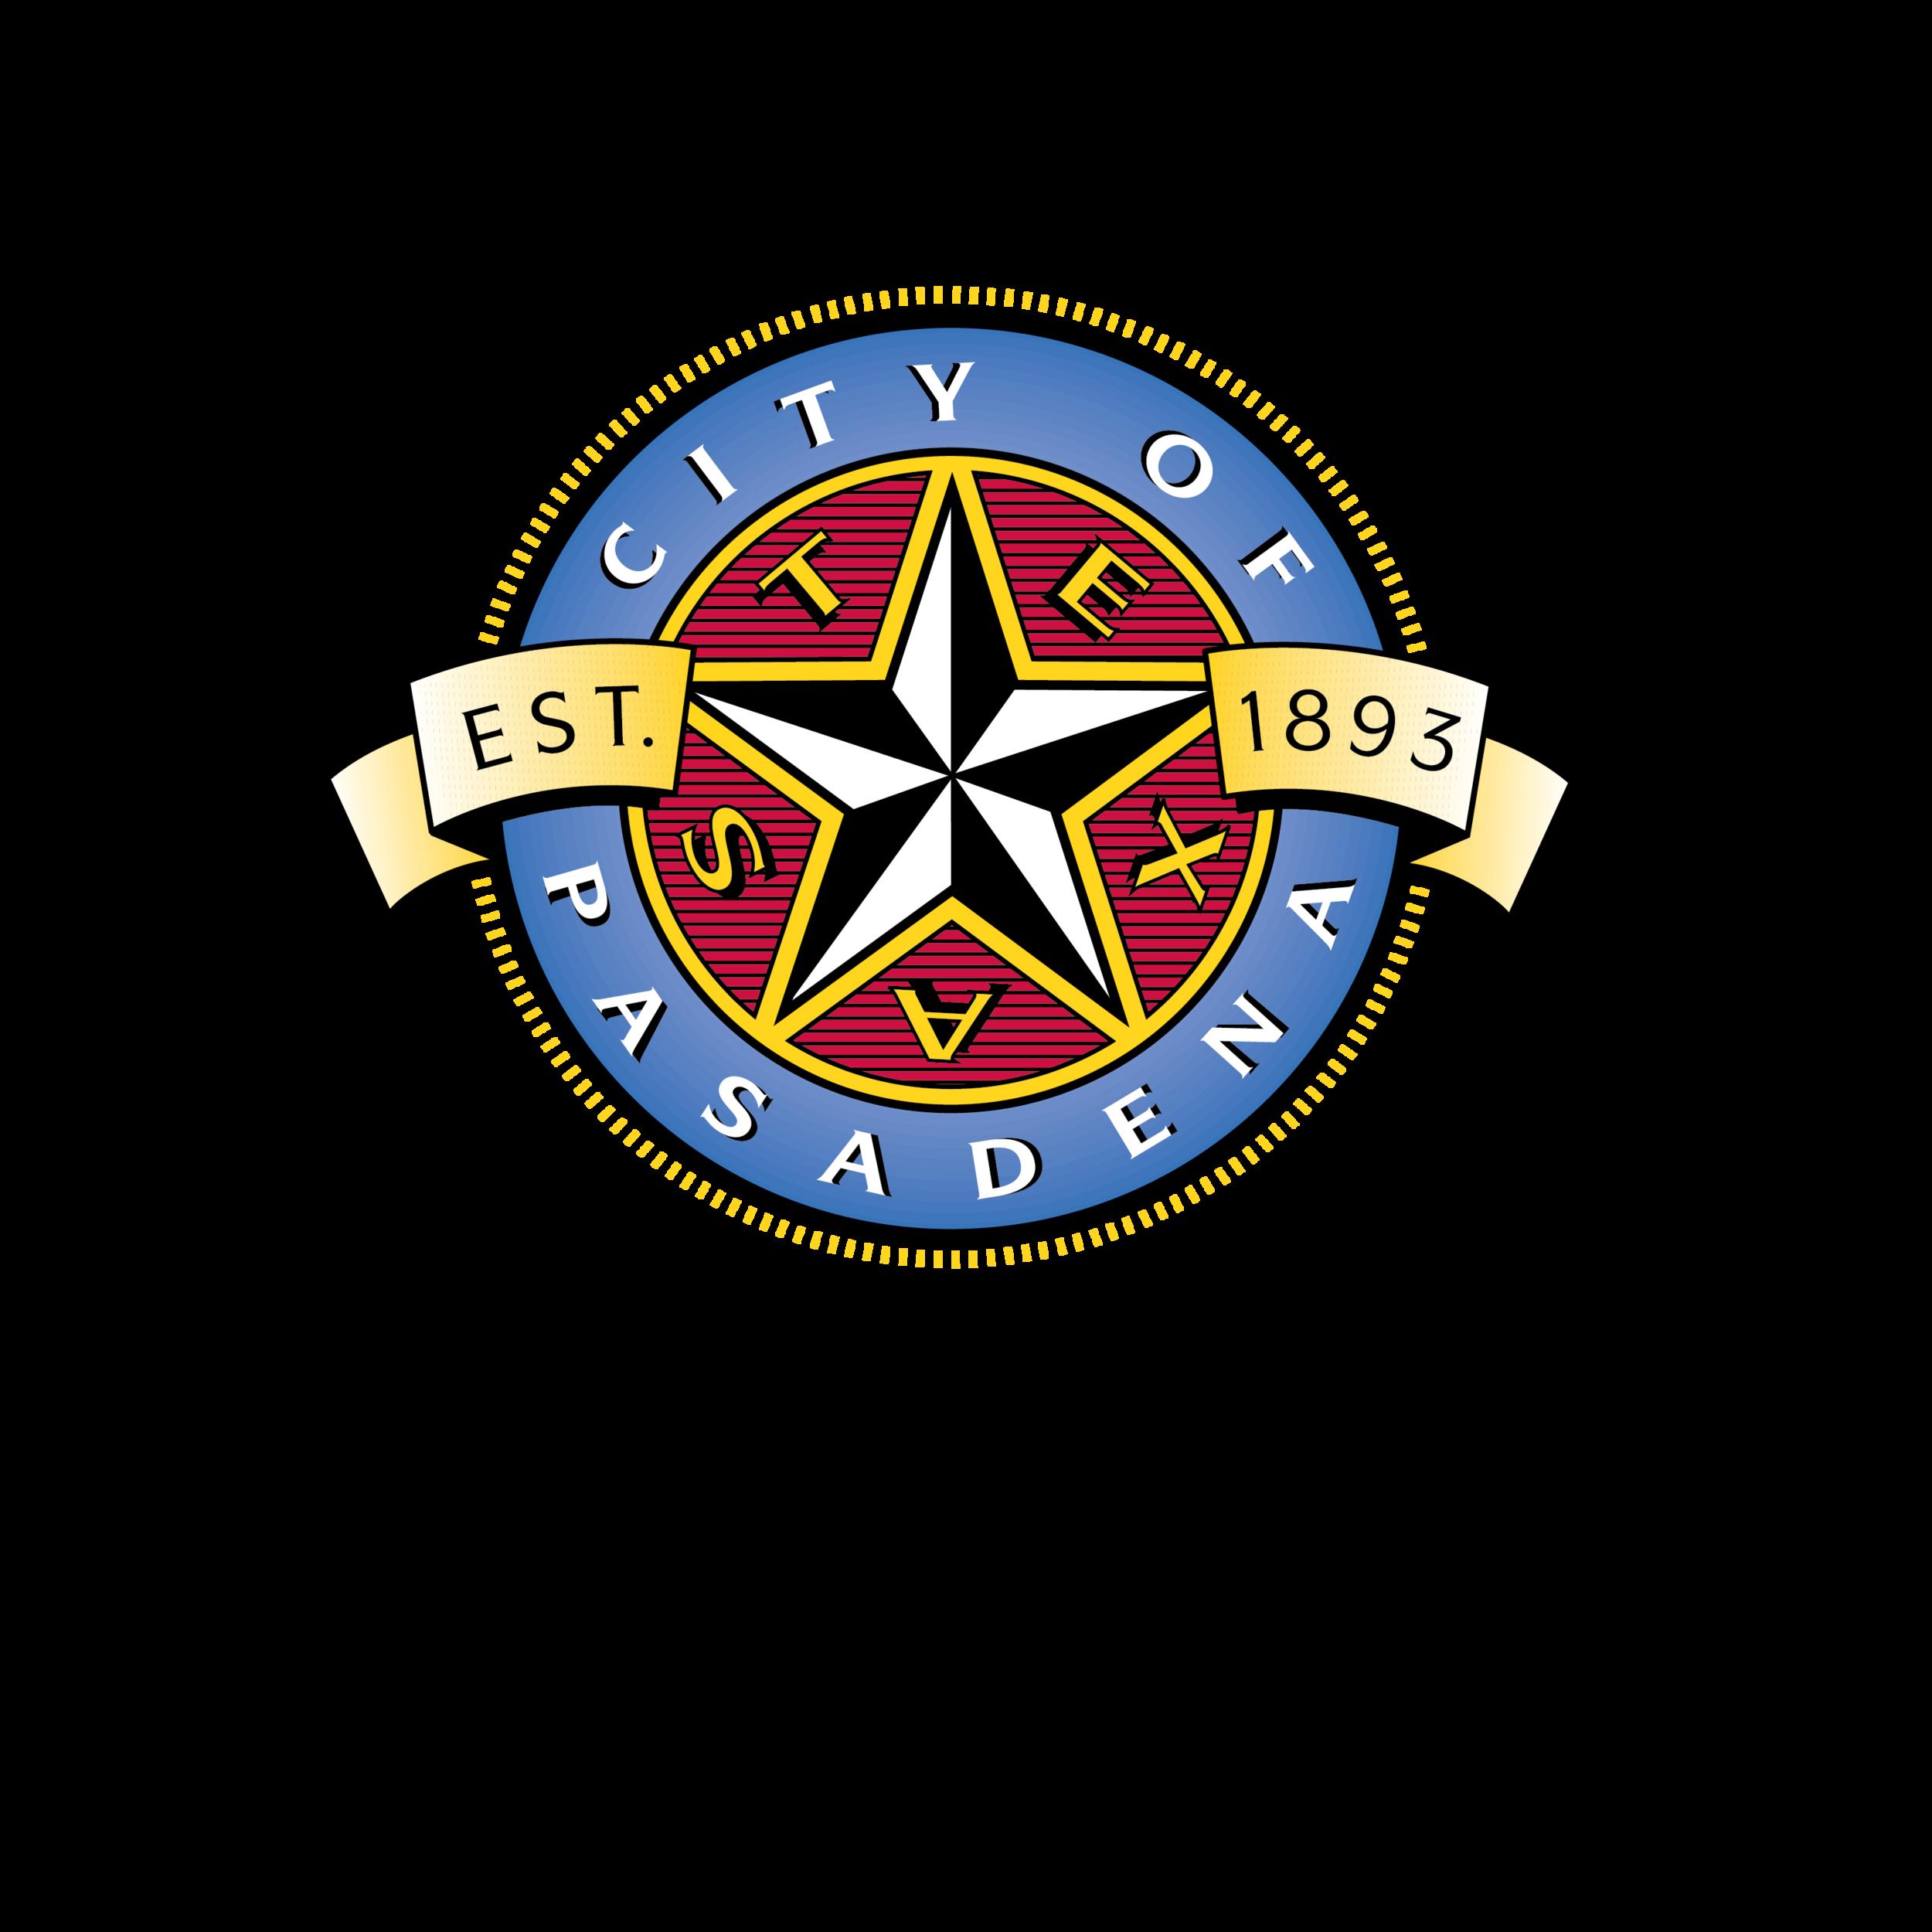 CORRECT LOGO_Four Color_City Logo_Jeff Wagner_For Light Backgrounds.png